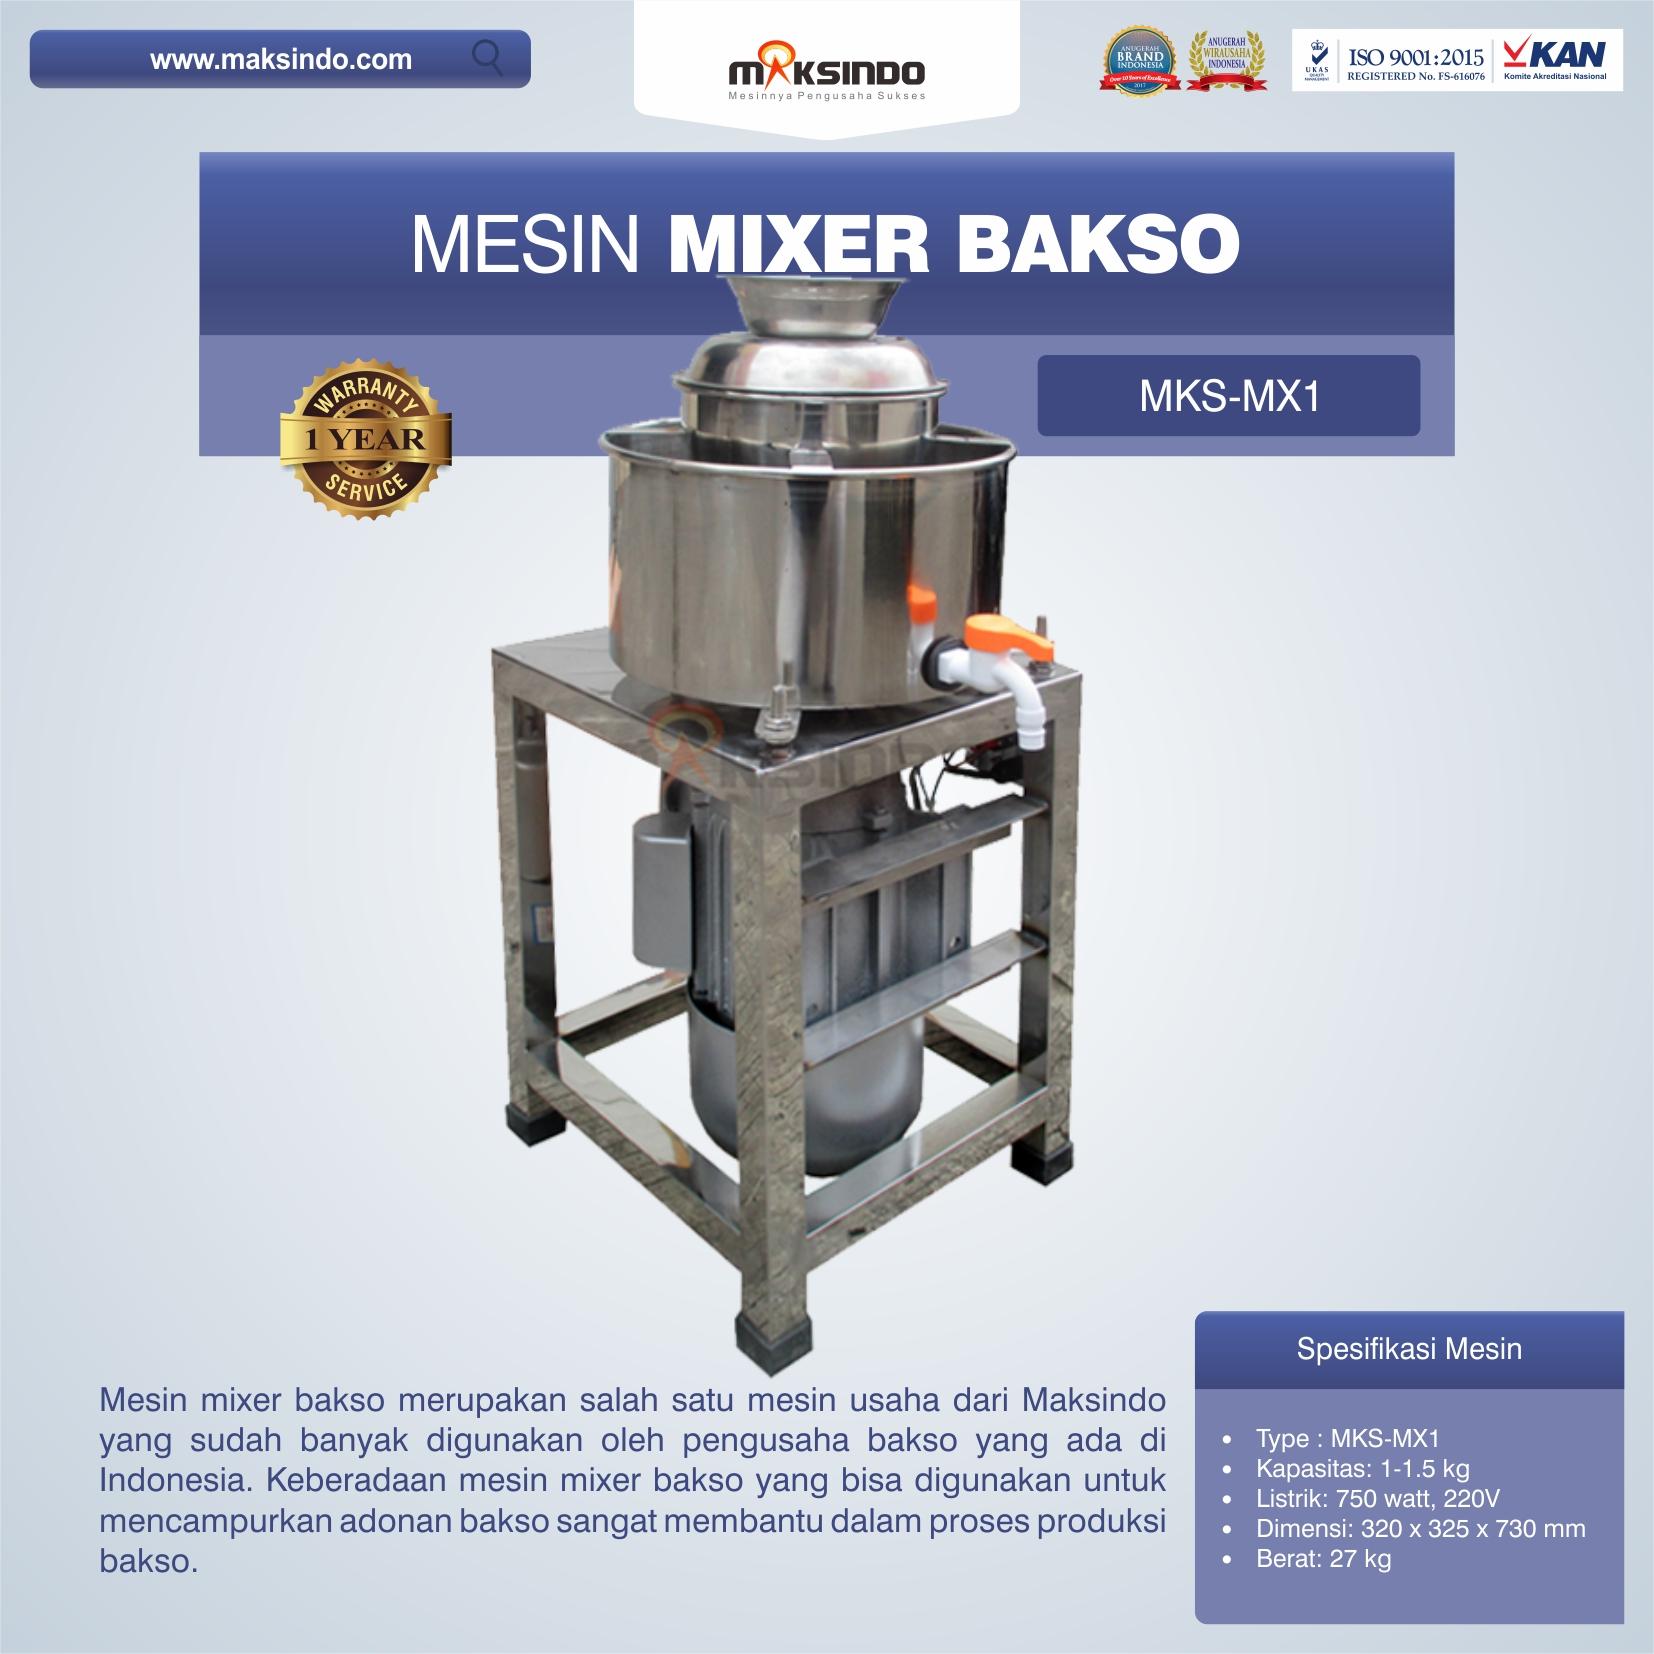 Mesin Mixer Bakso MKS-MX1